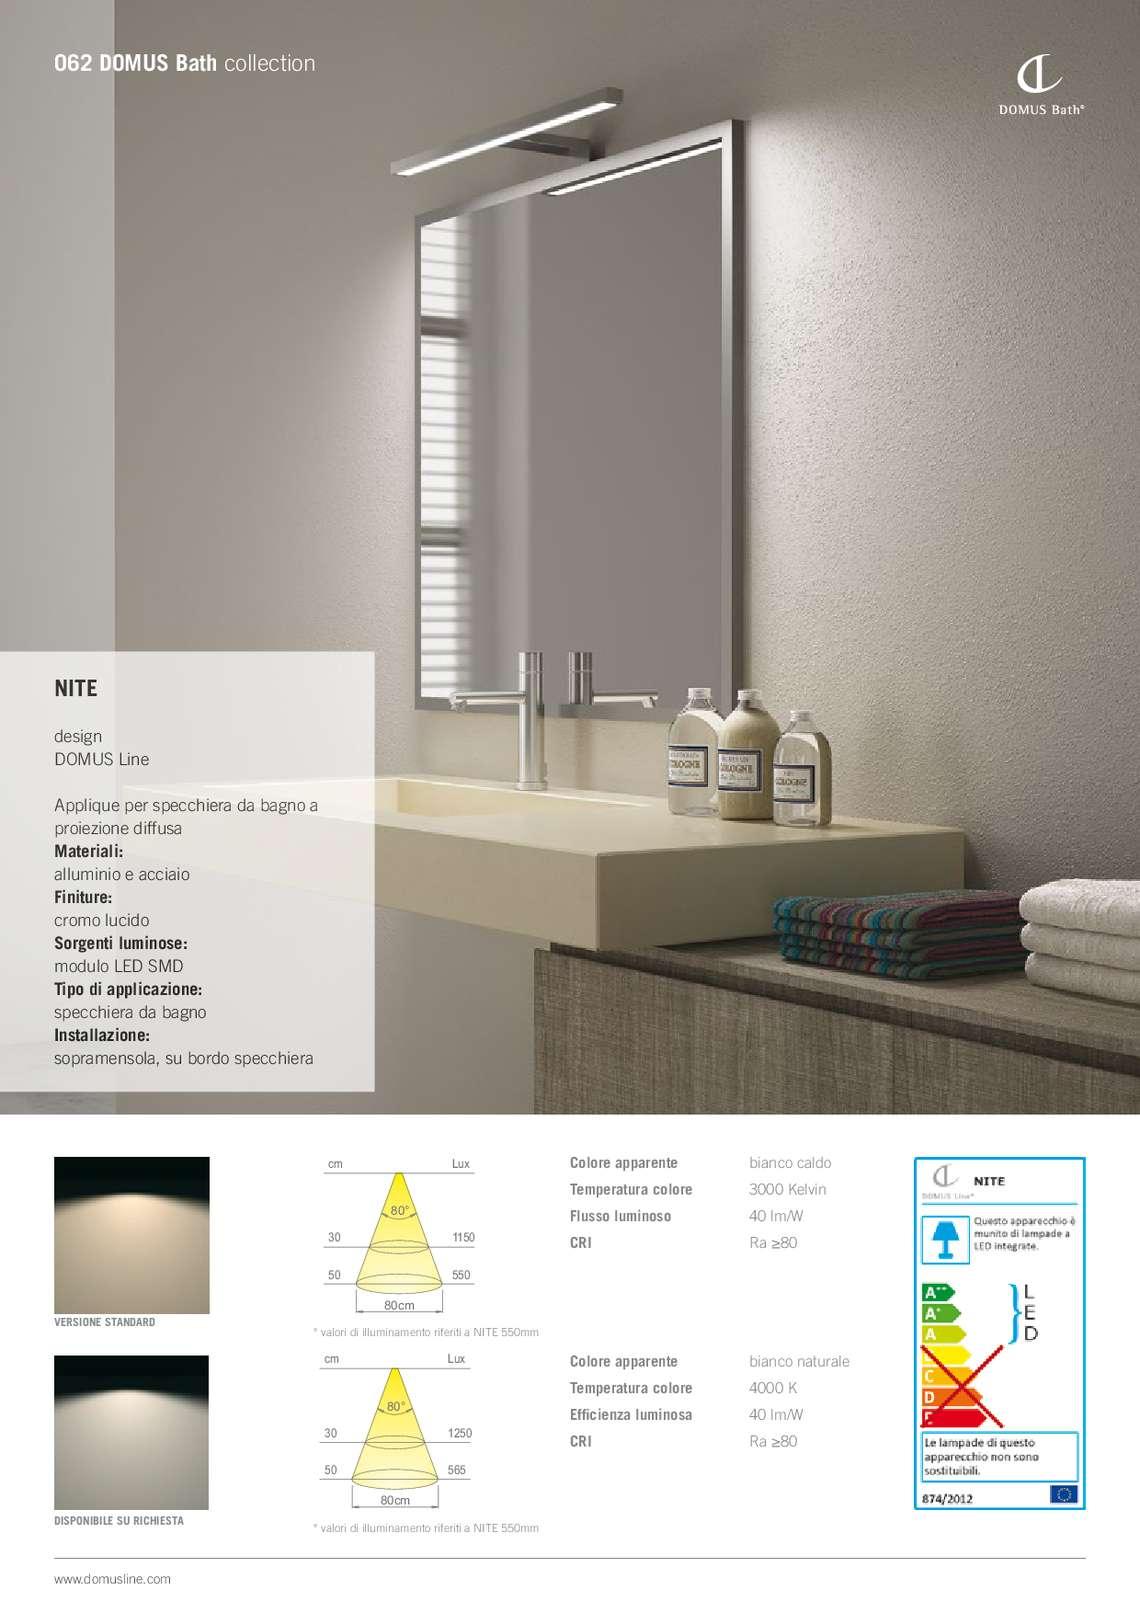 domus-line-illuminazione_26_062.jpg